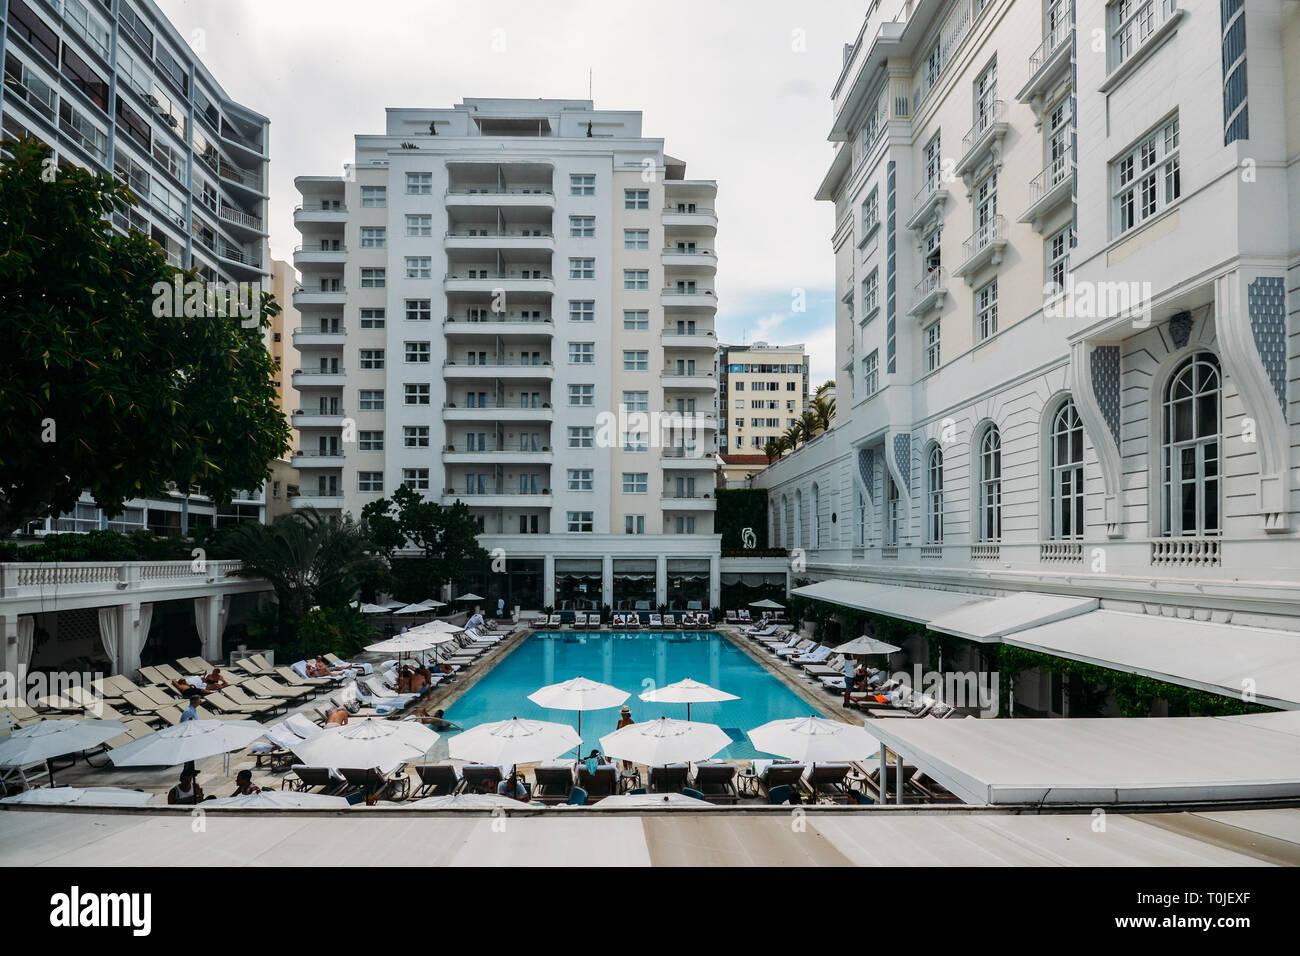 Swimming Pool Lounge Chairs Umbrella Stock Photos